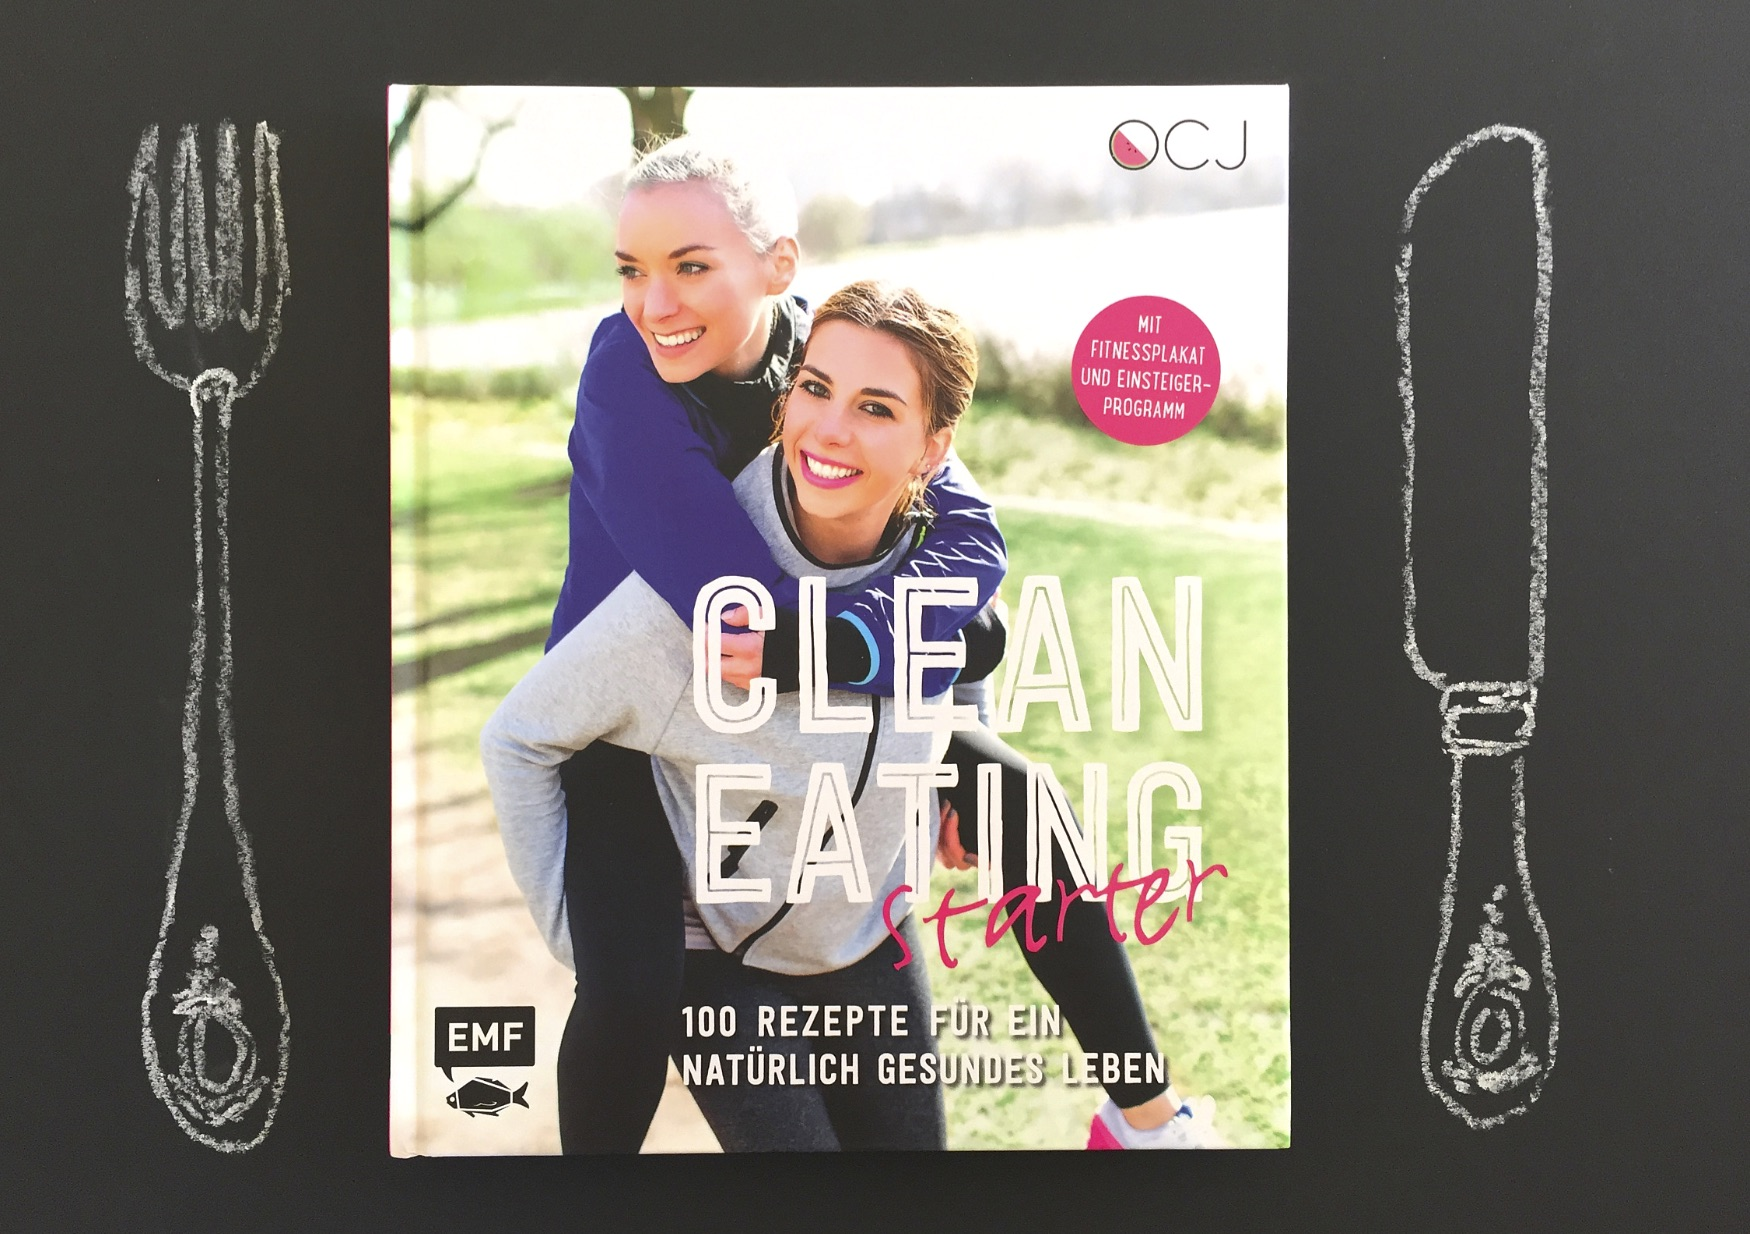 Clean eating Starter Verlag EMF www.meinesvenja.de